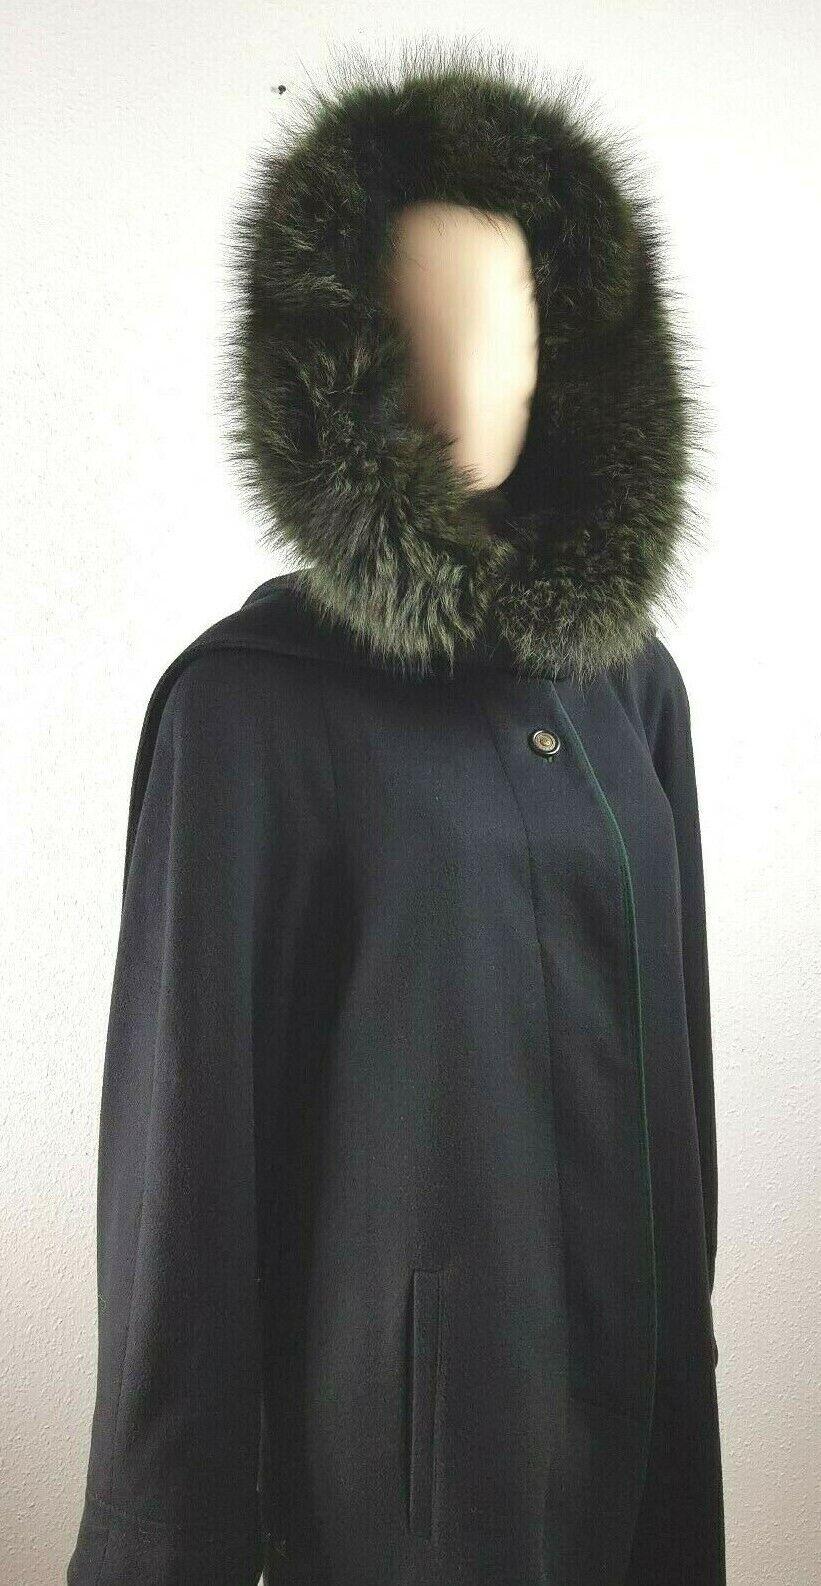 Lothar Repp Damen Mantel Wolle Cashmere Coat Lodenmantel grüner Pelzkragen 38 M